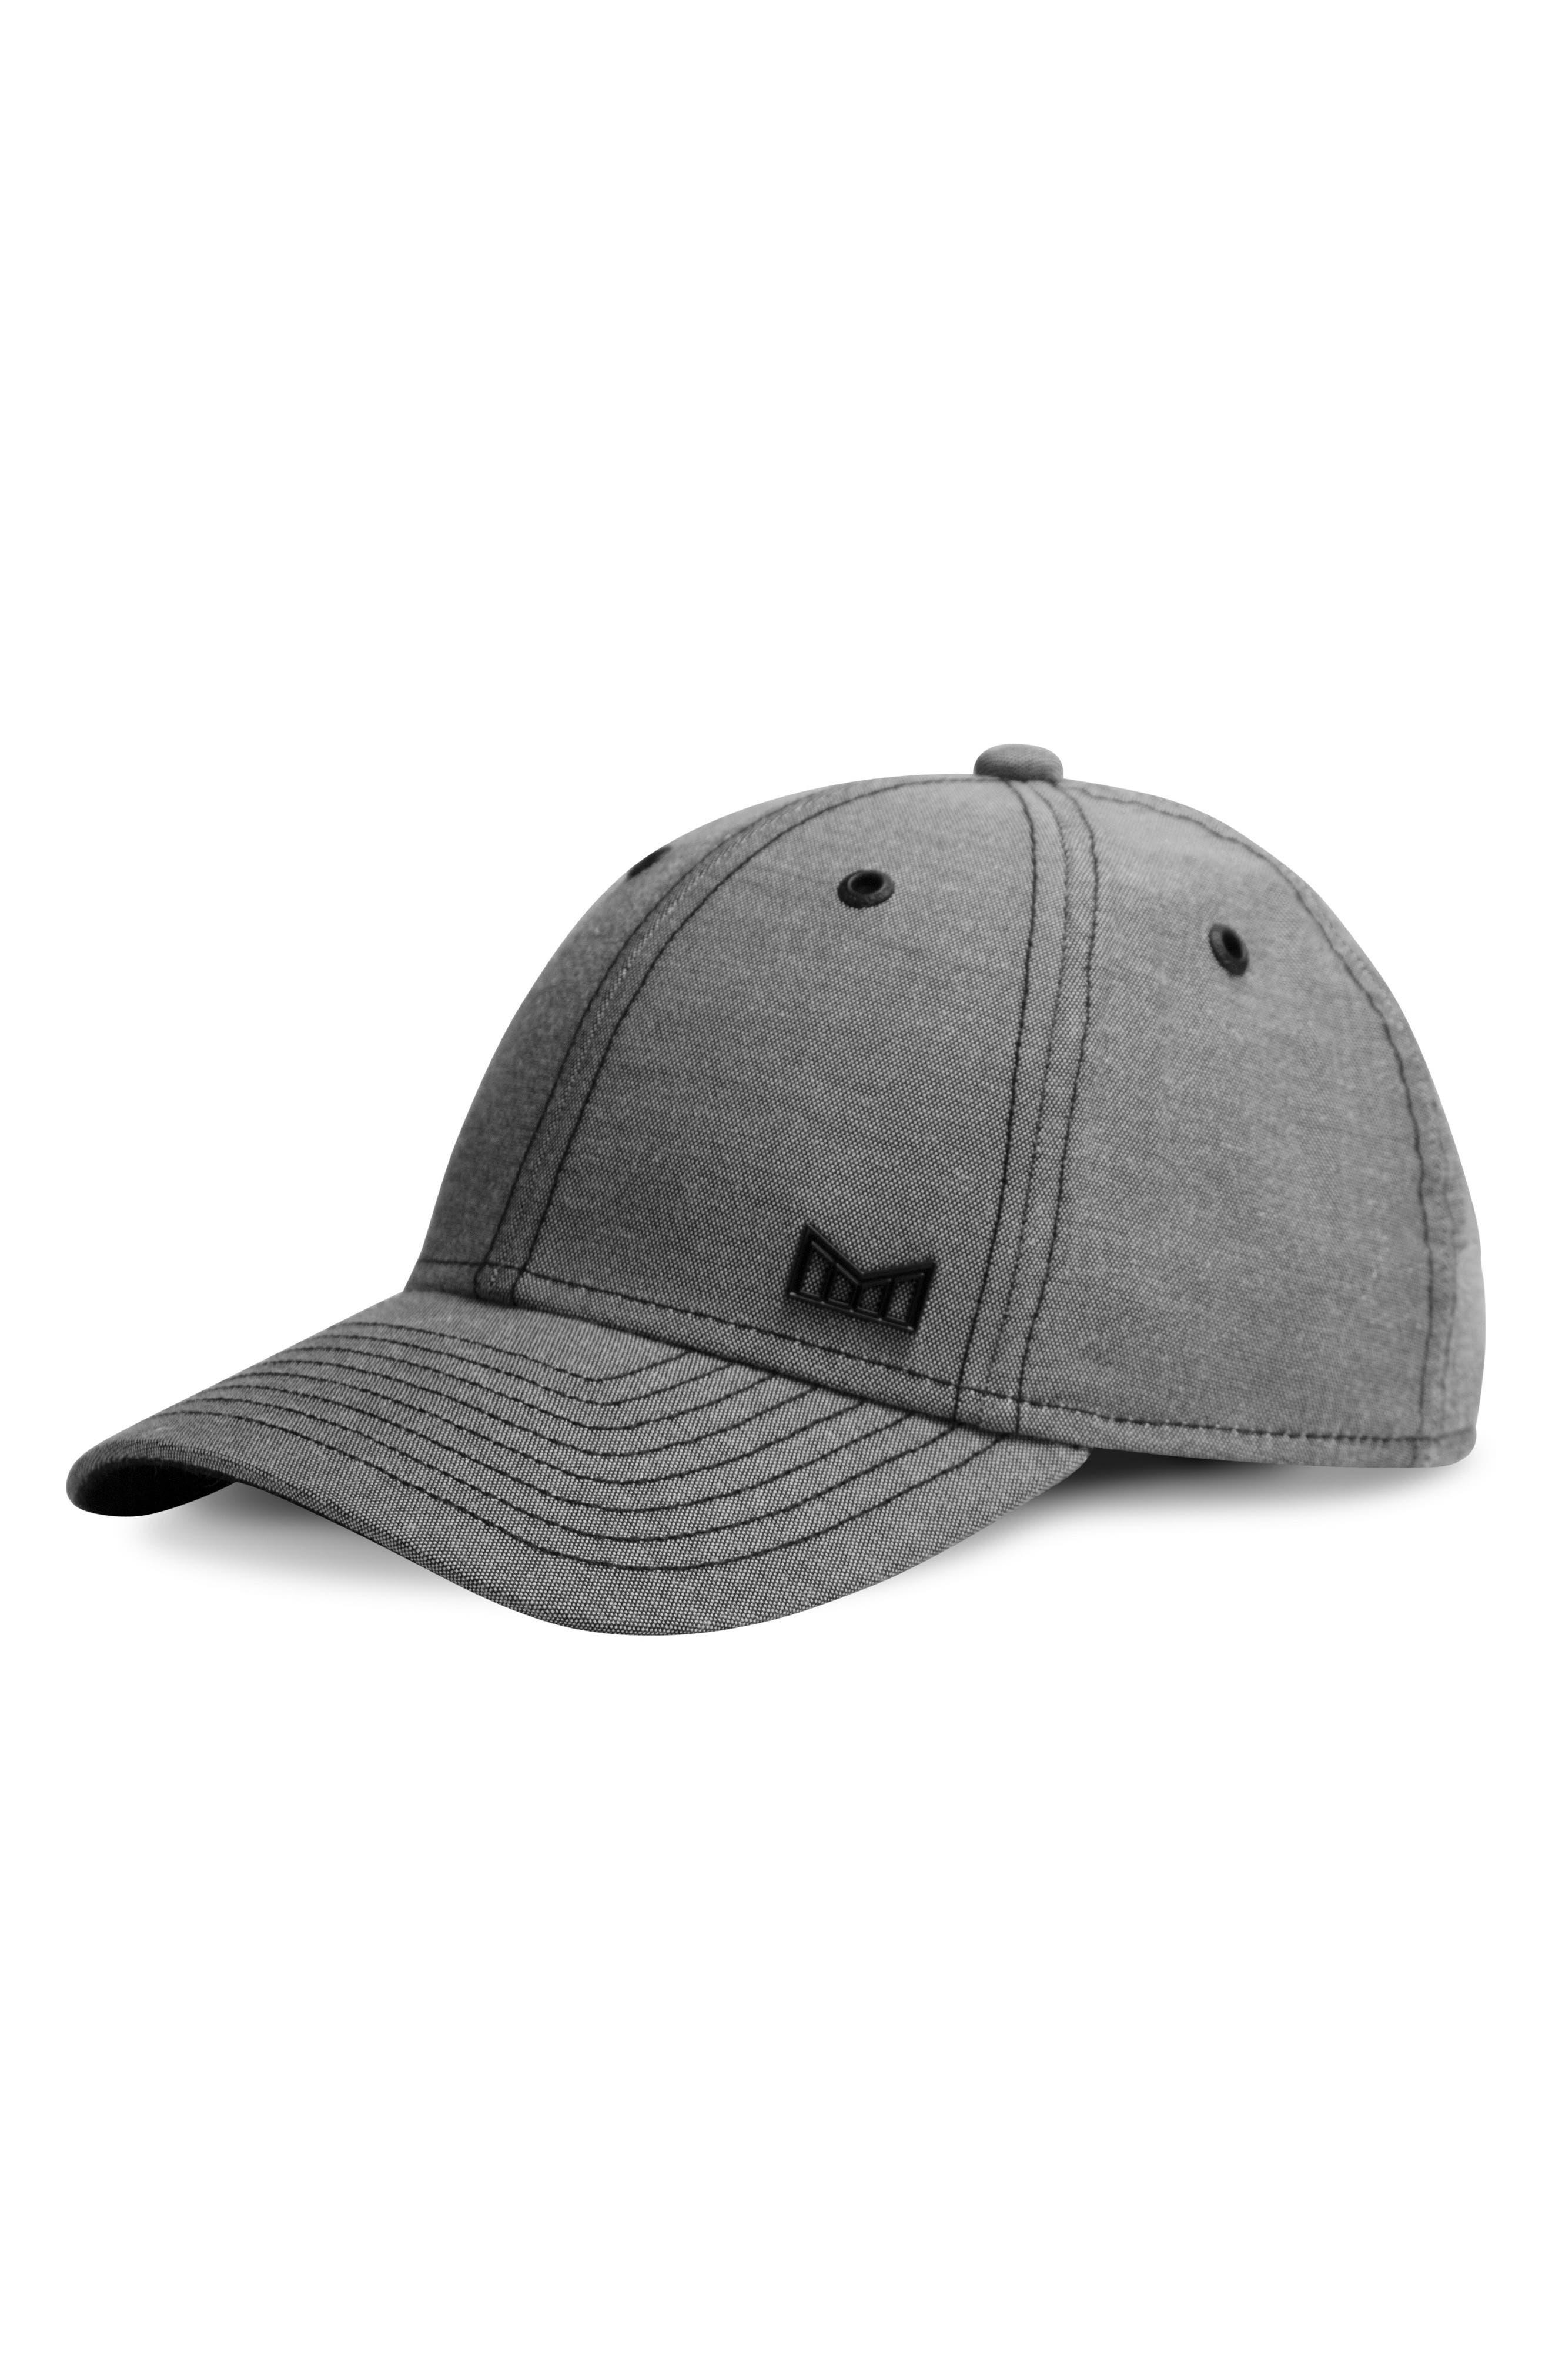 Main Image - Melin Scholar Snapback Baseball Cap